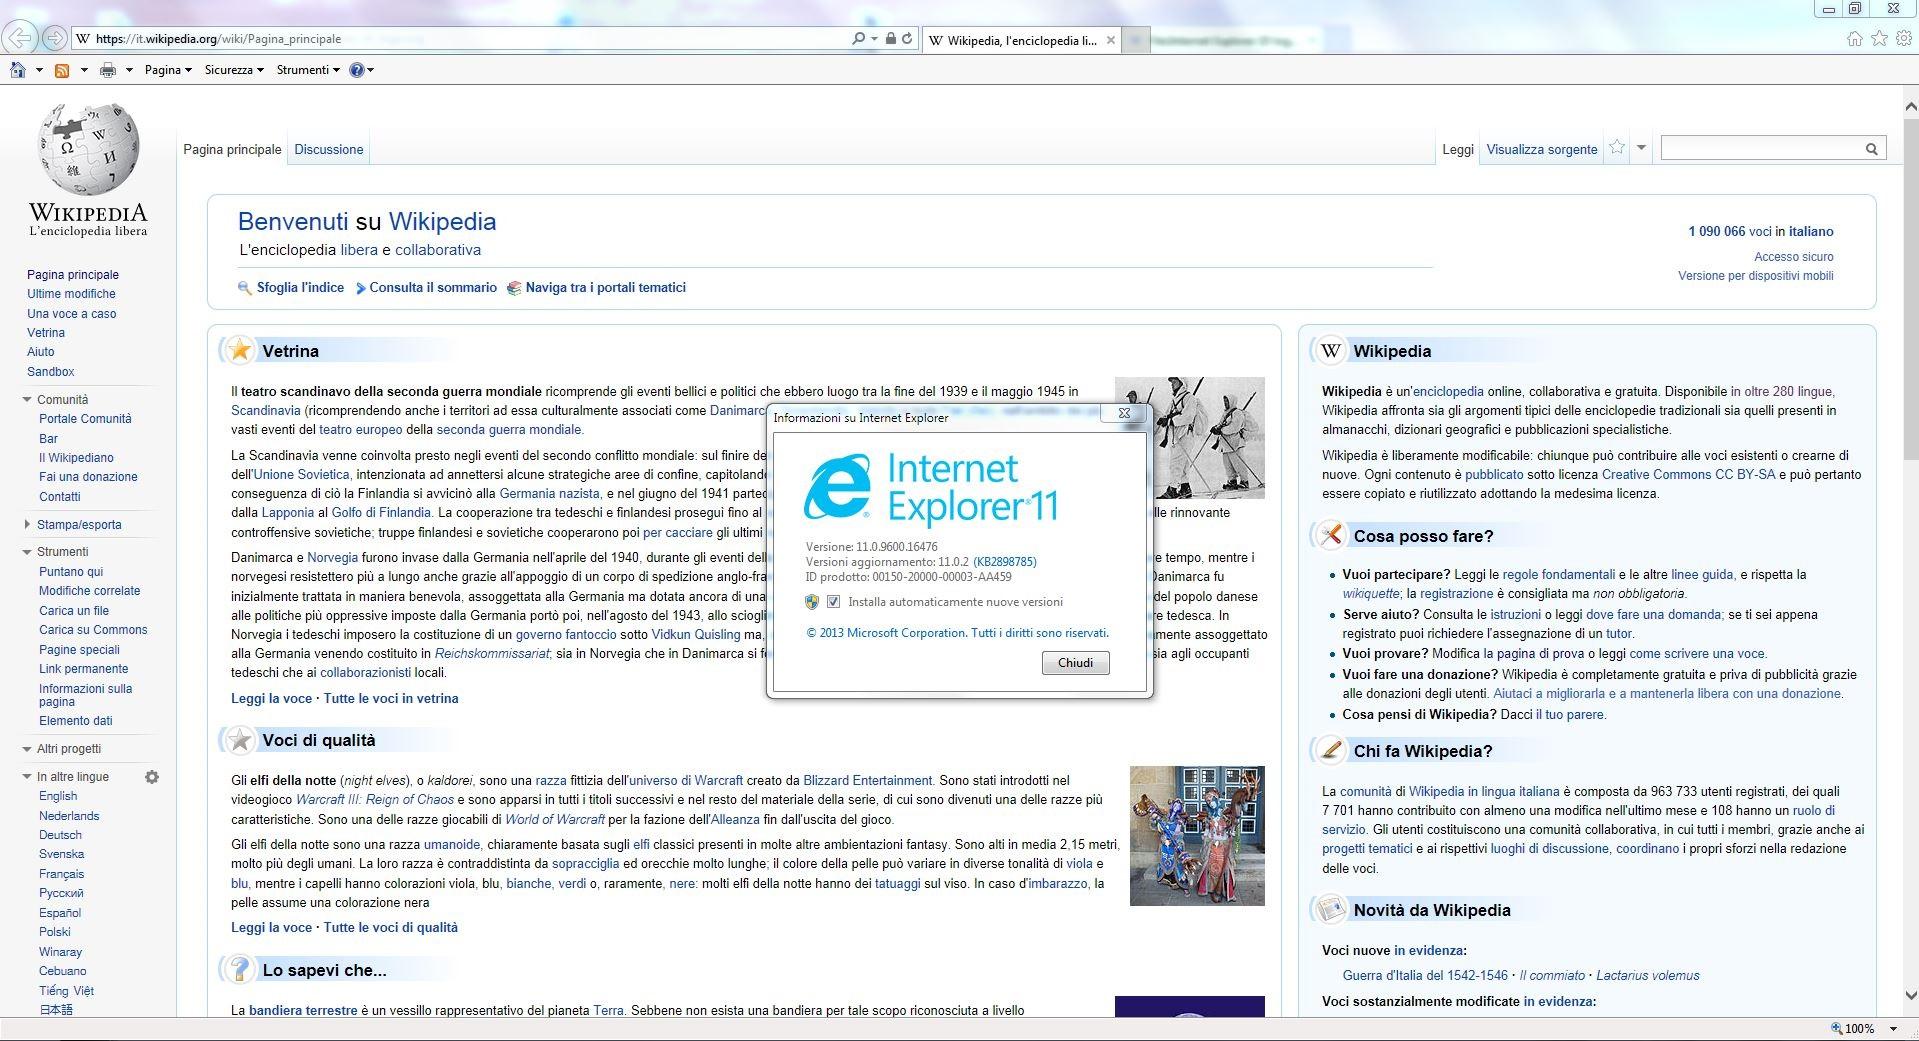 Iceweasel browser wiki